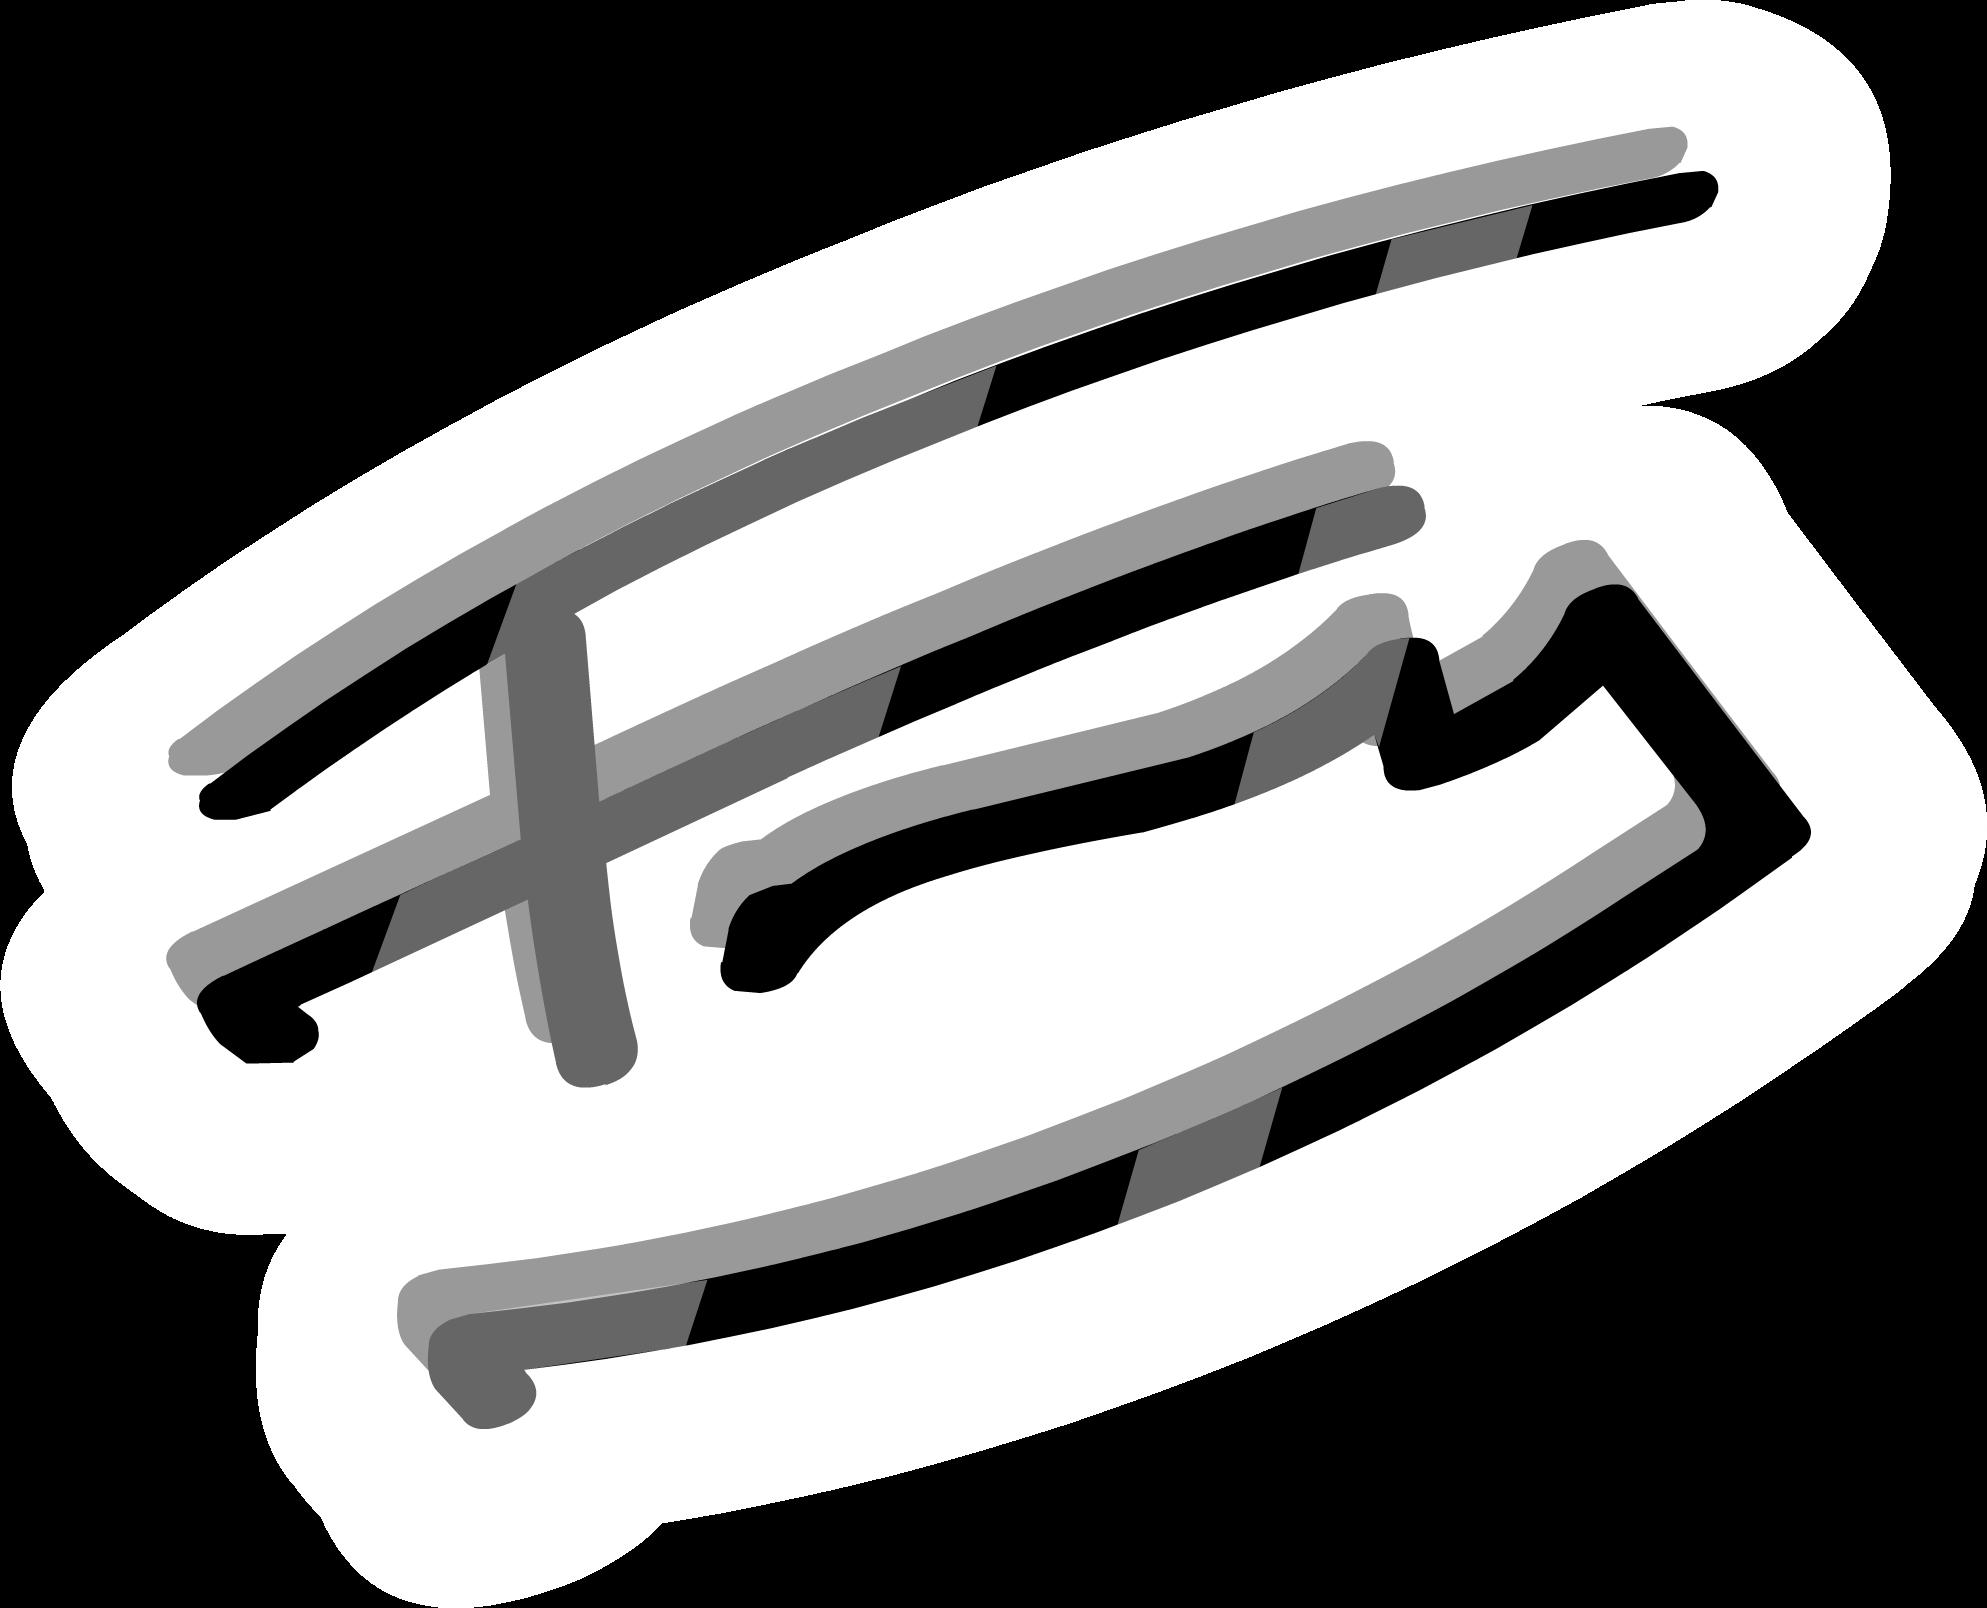 Pin de Franky